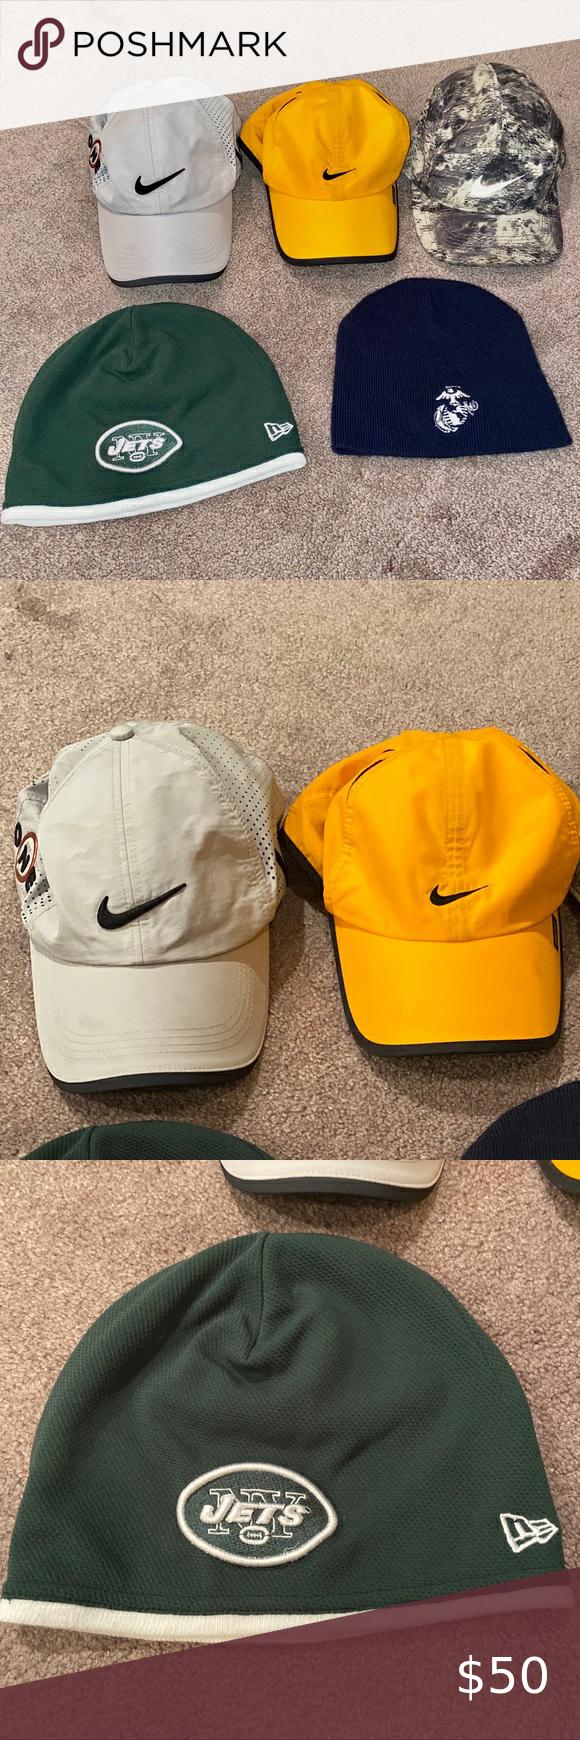 Nike Hat Bundle Nike Hat Nike Nike Accessories